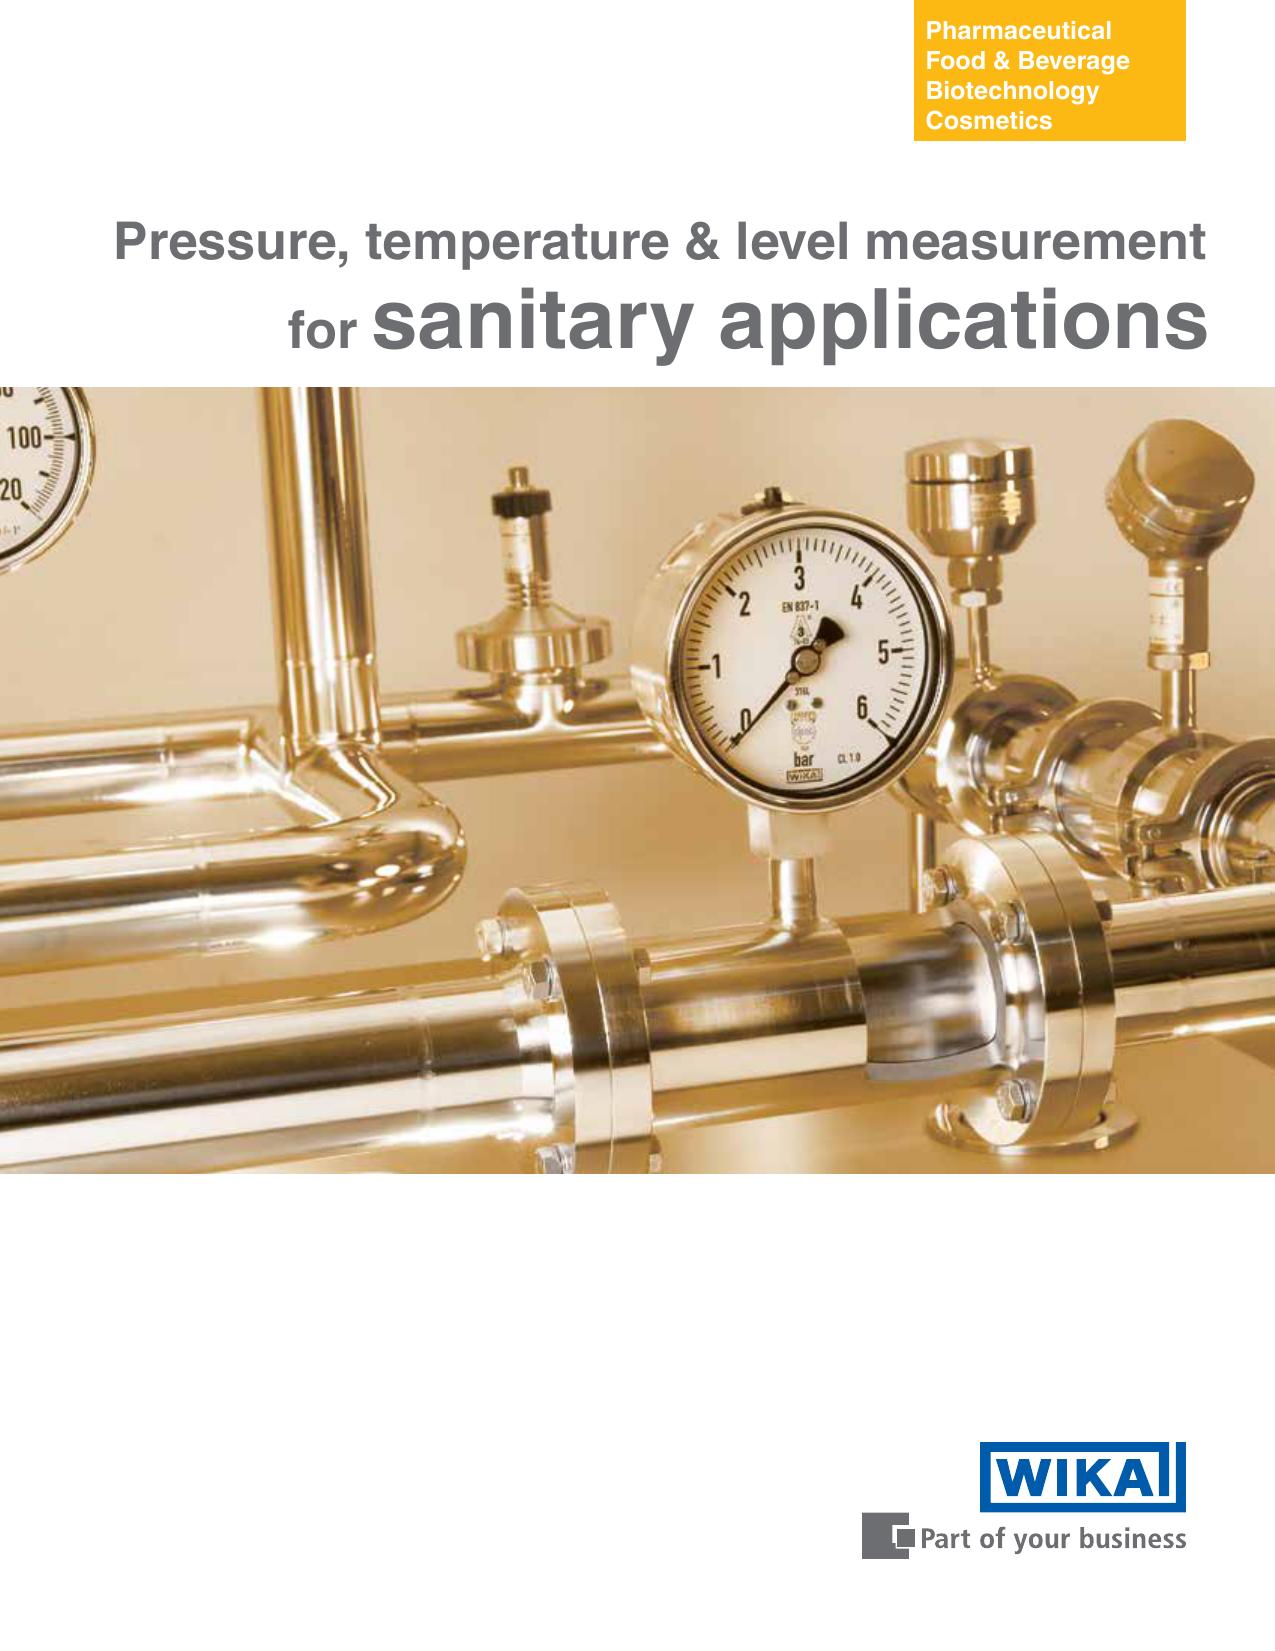 Wika S11 Pressure Transmitter Range: 0 Bar to 10 Bar Along With Calibration Certificate